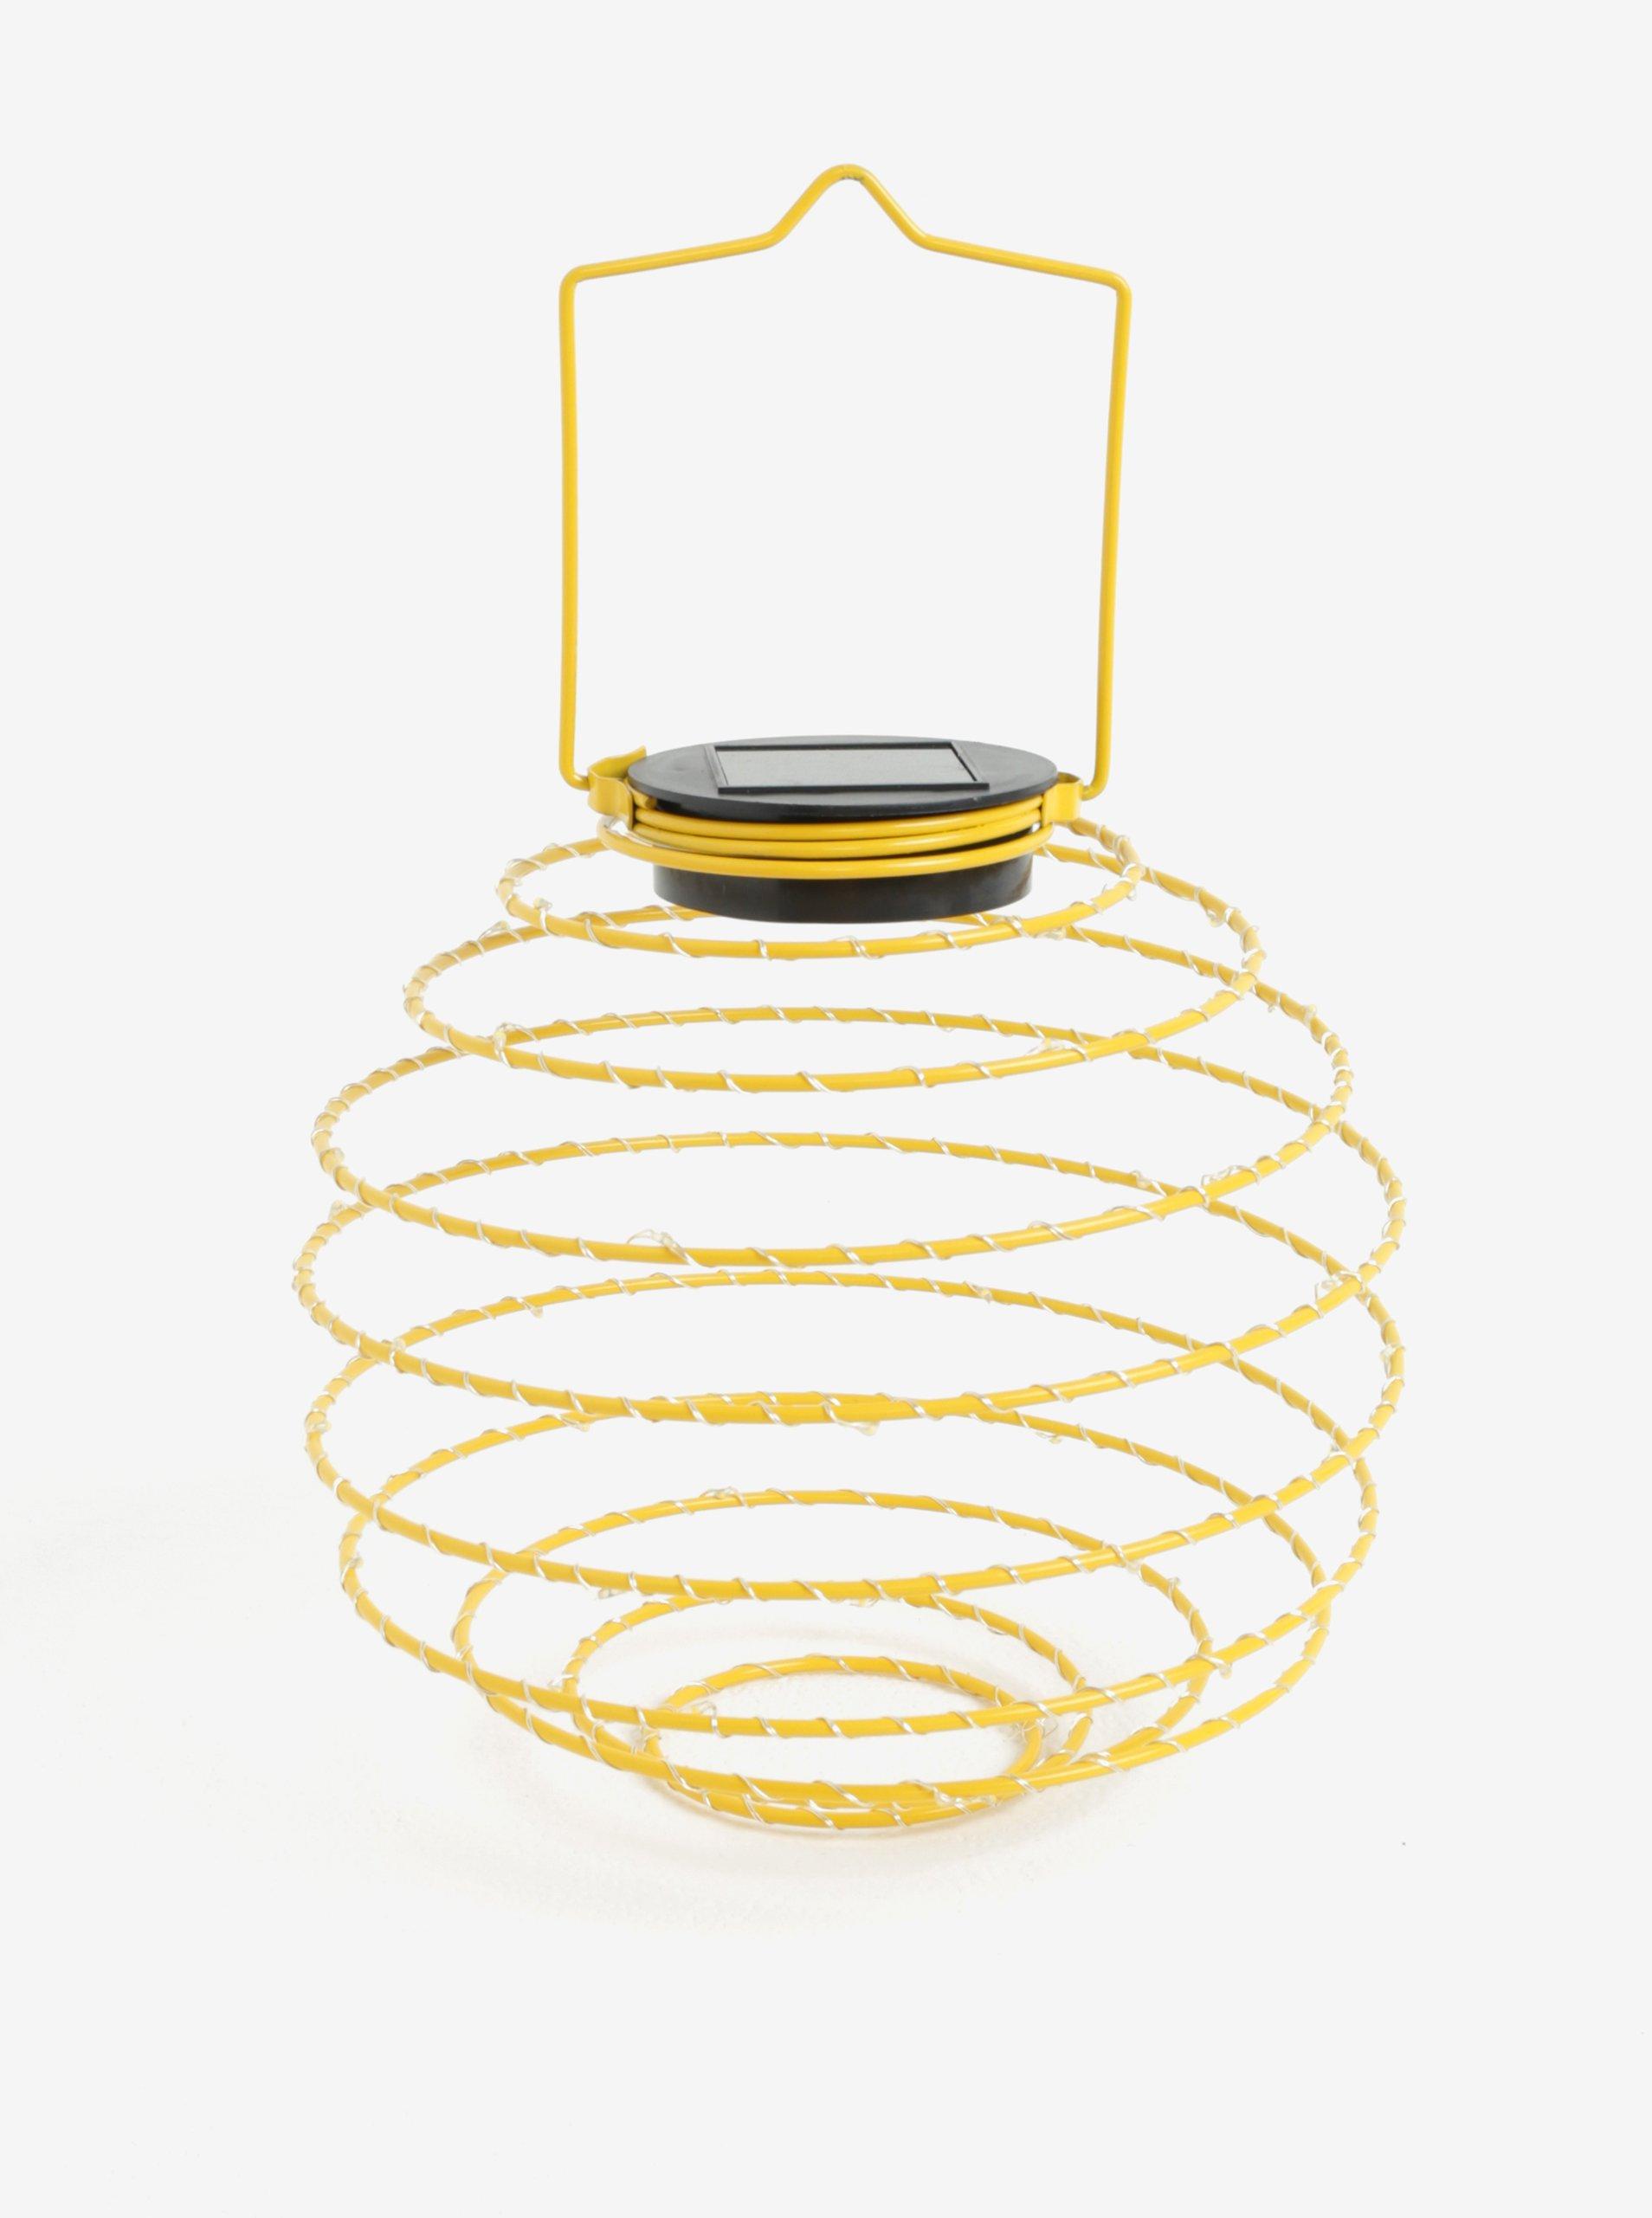 Žlutá LED solární dekorace Kaemingk